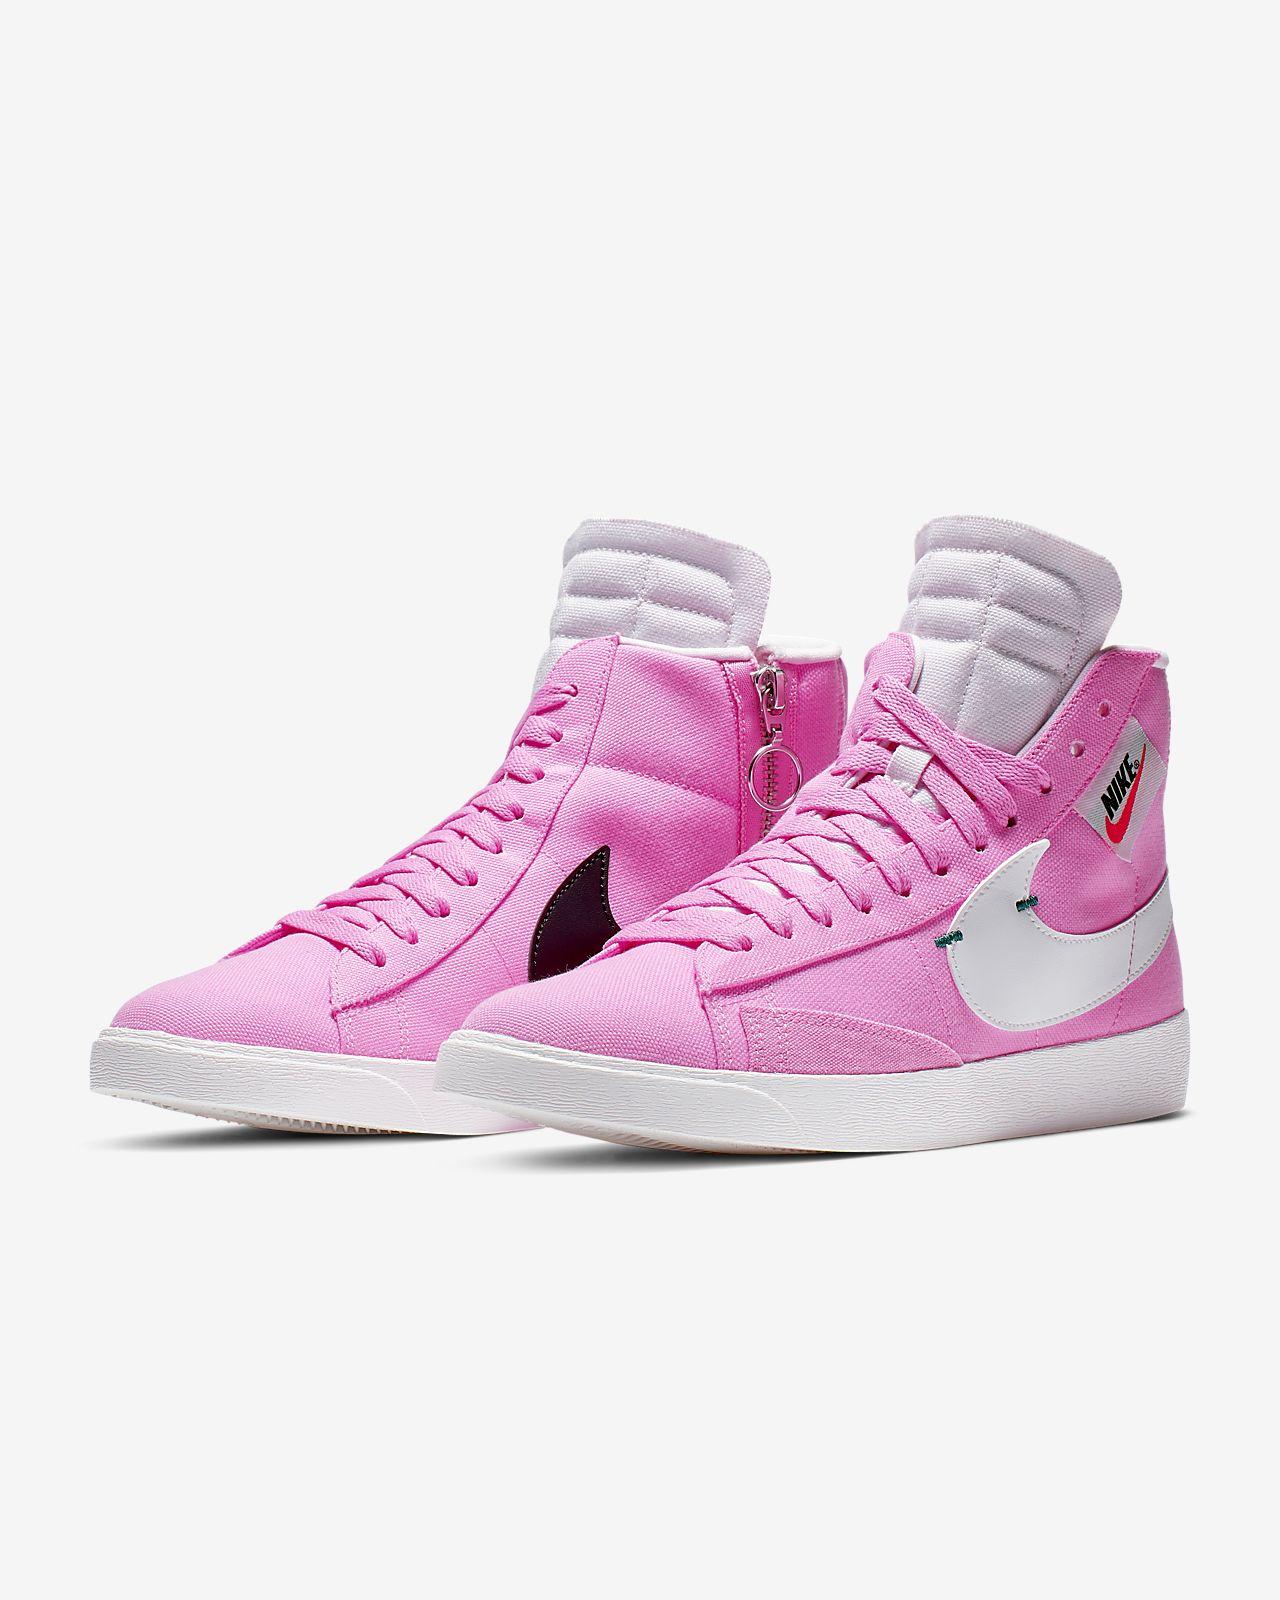 20f599c7659d Nike Blazer Mid Rebel Women s Shoe. Nike.com ZA